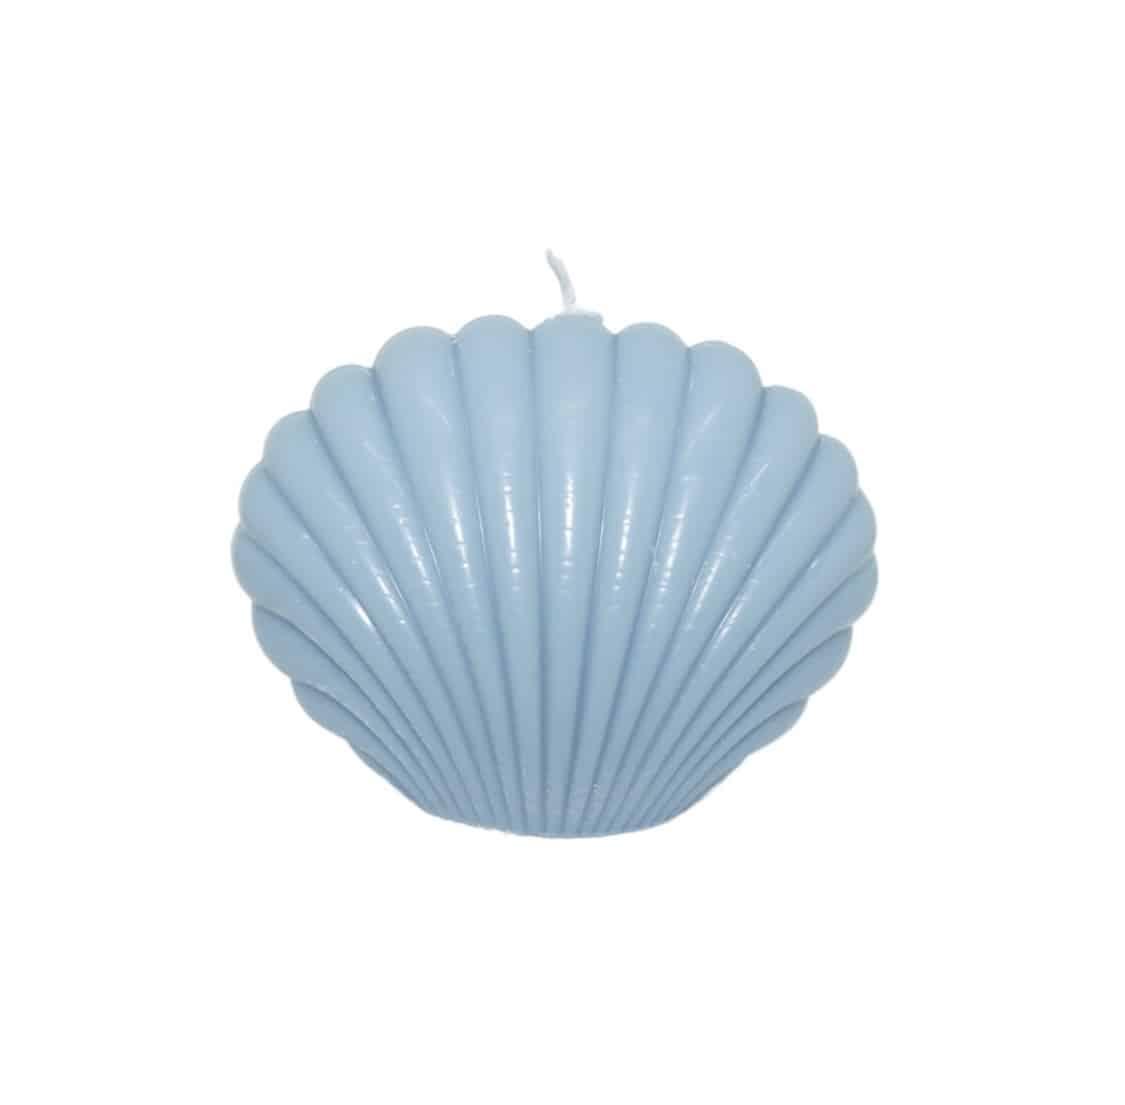 Bougie coquillage bleu pastel sur fond blanc surfing road